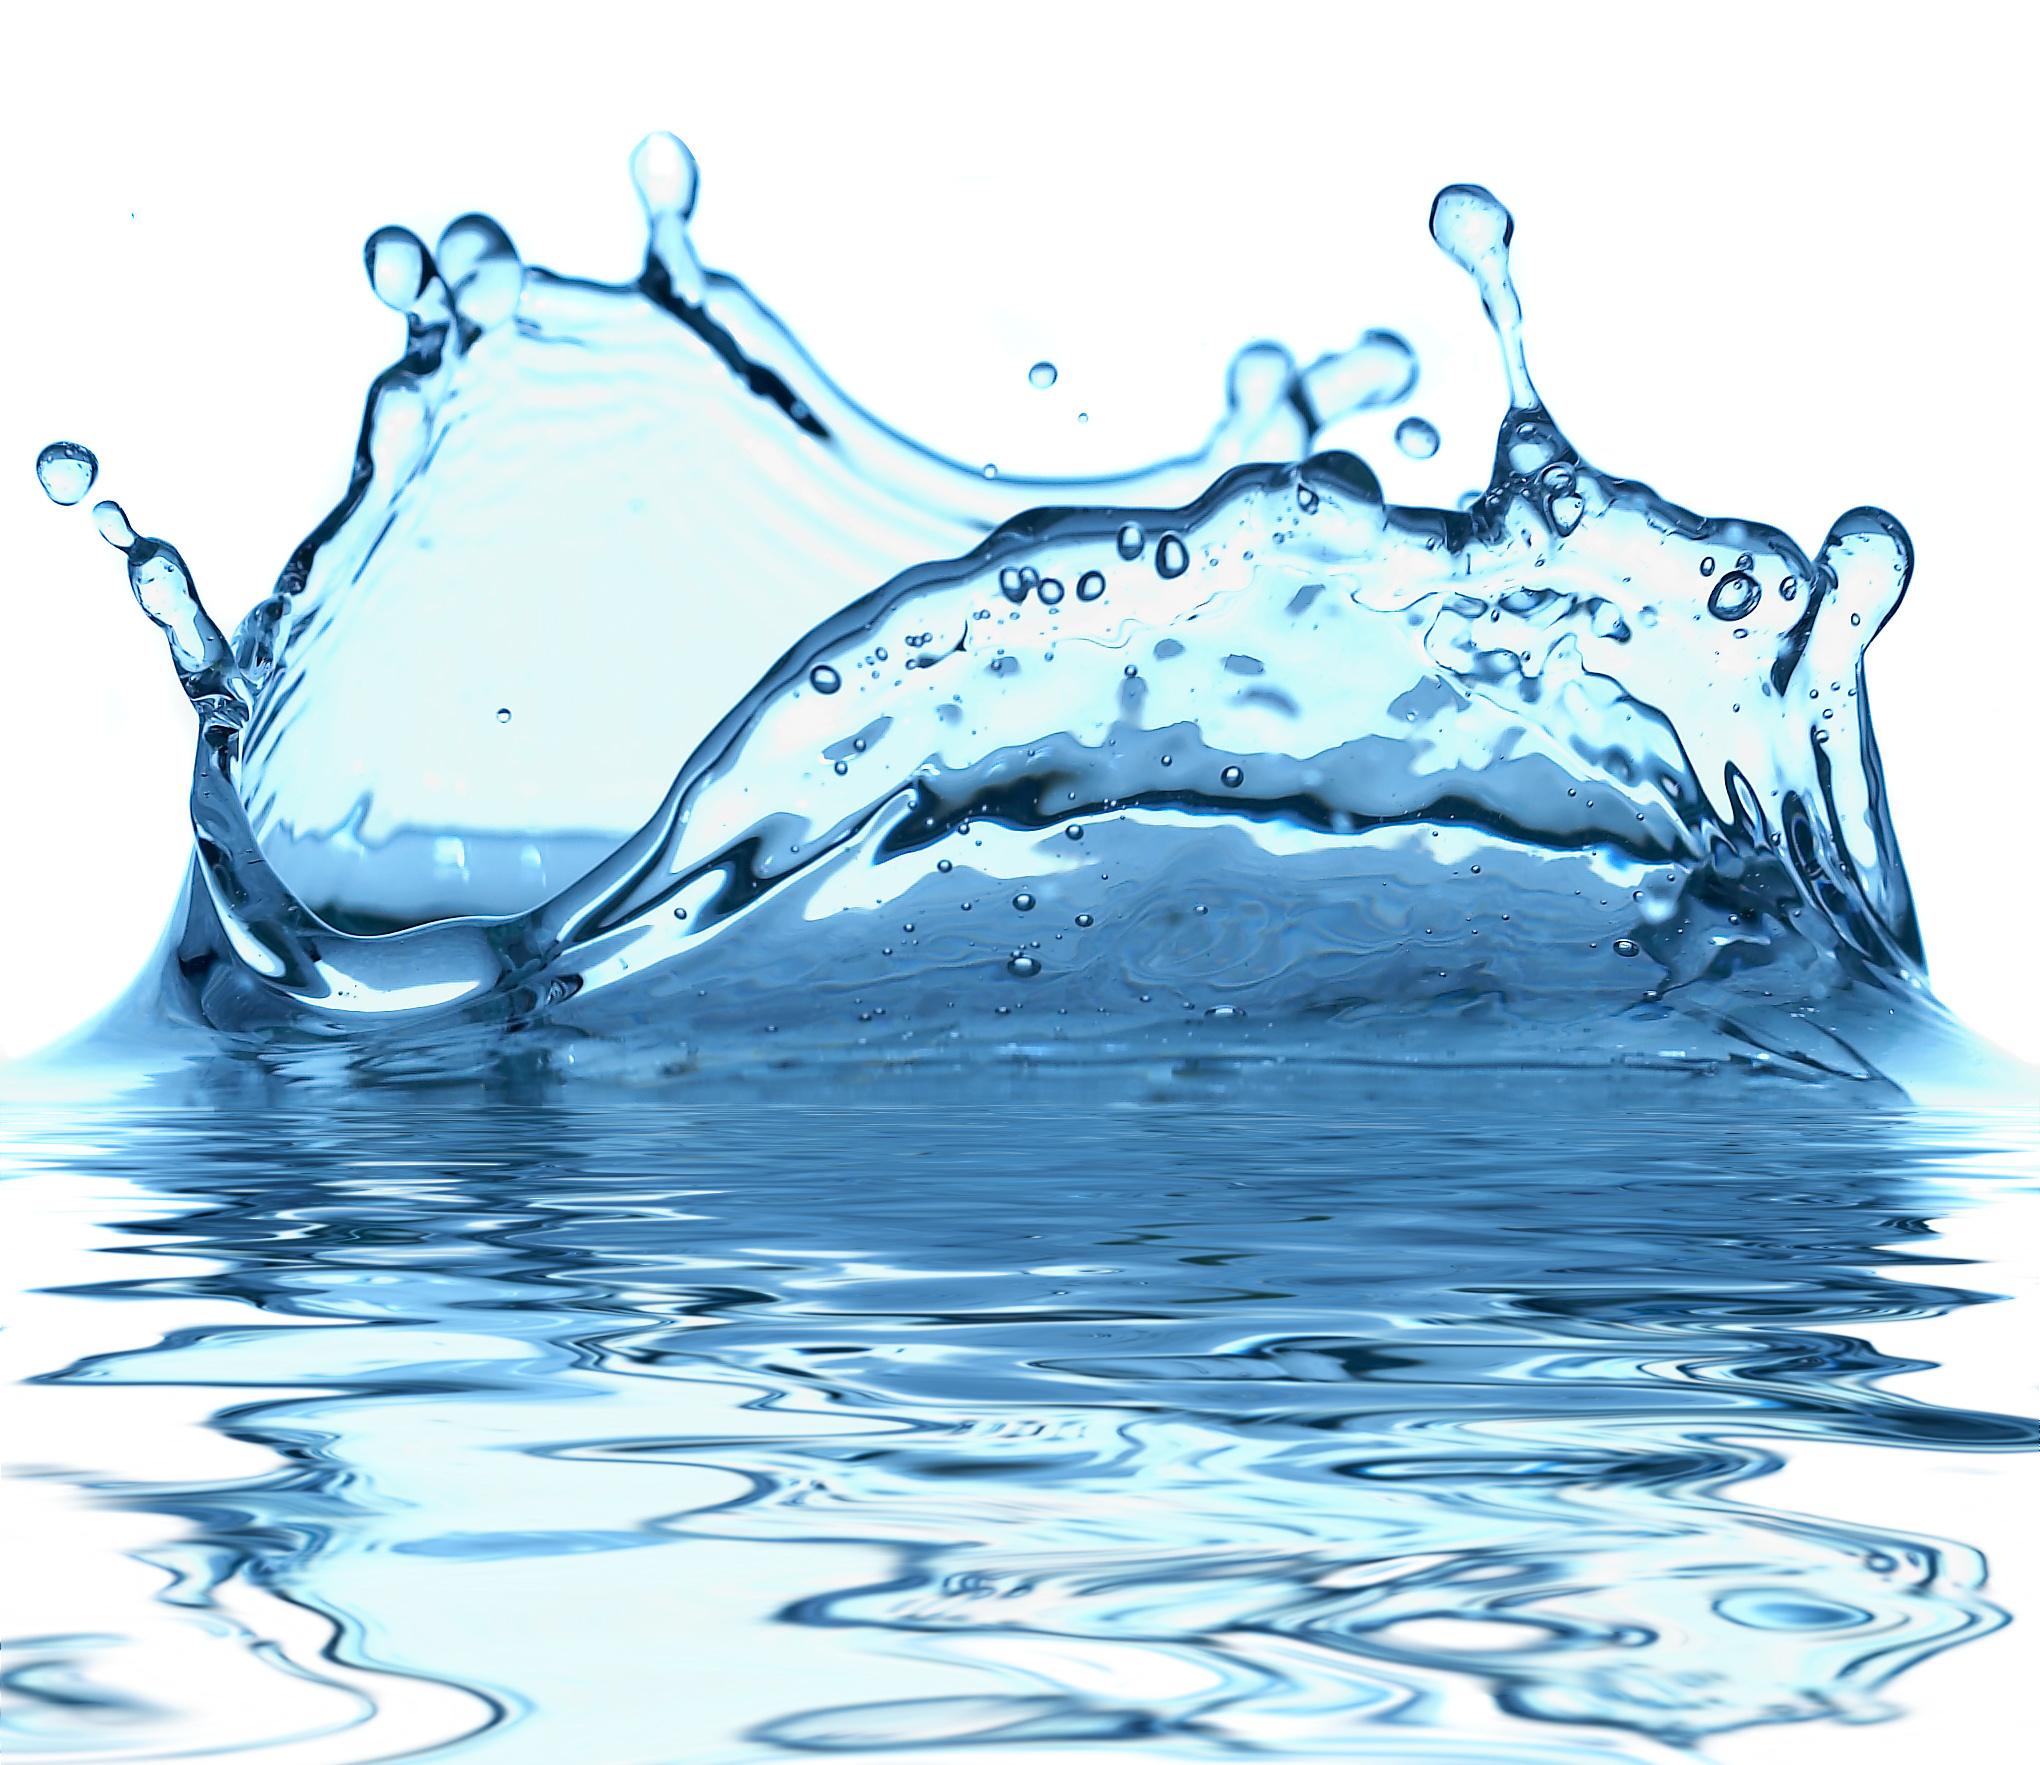 Water splash isolated stock. Waves clipart three